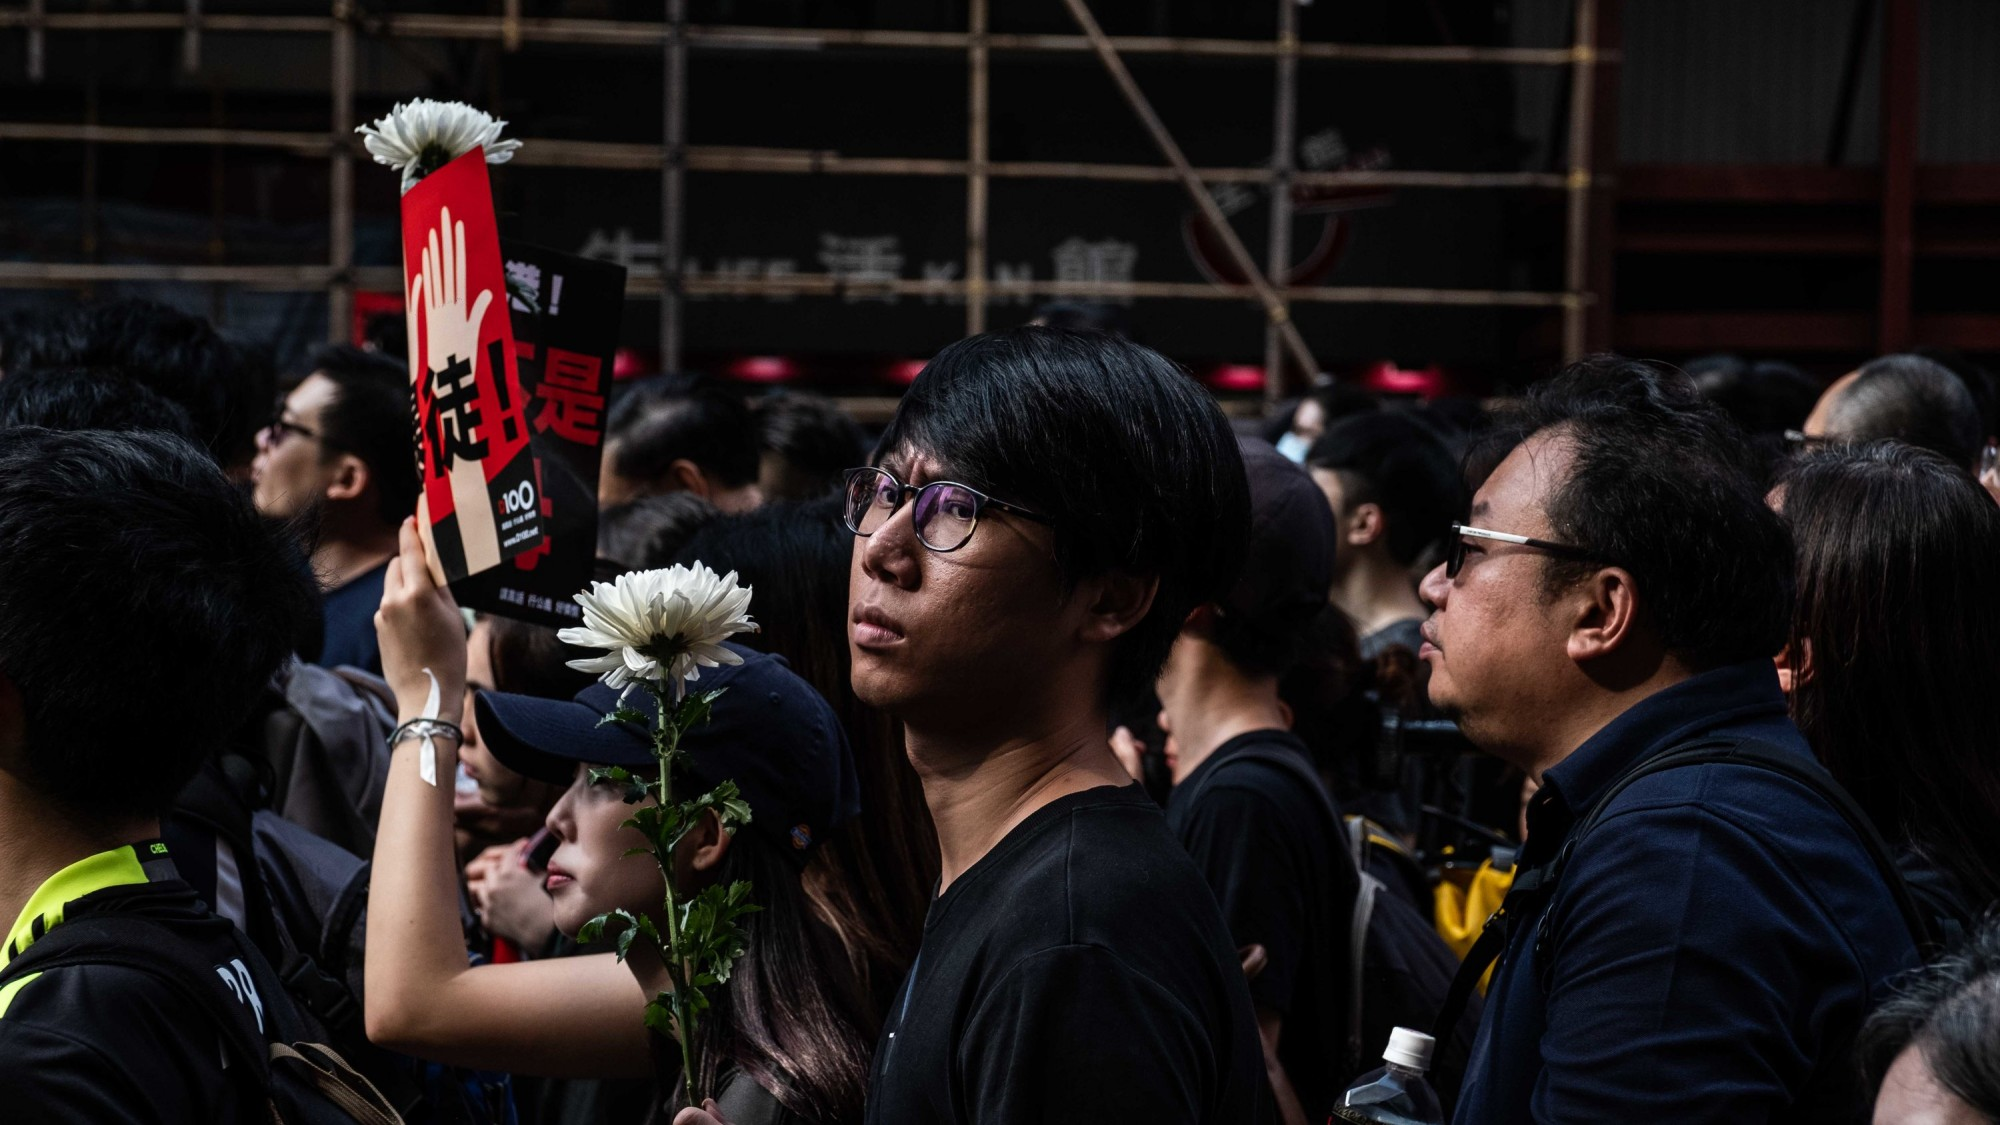 Héctor Retamal/AFP/Getty Images/SCANPIX